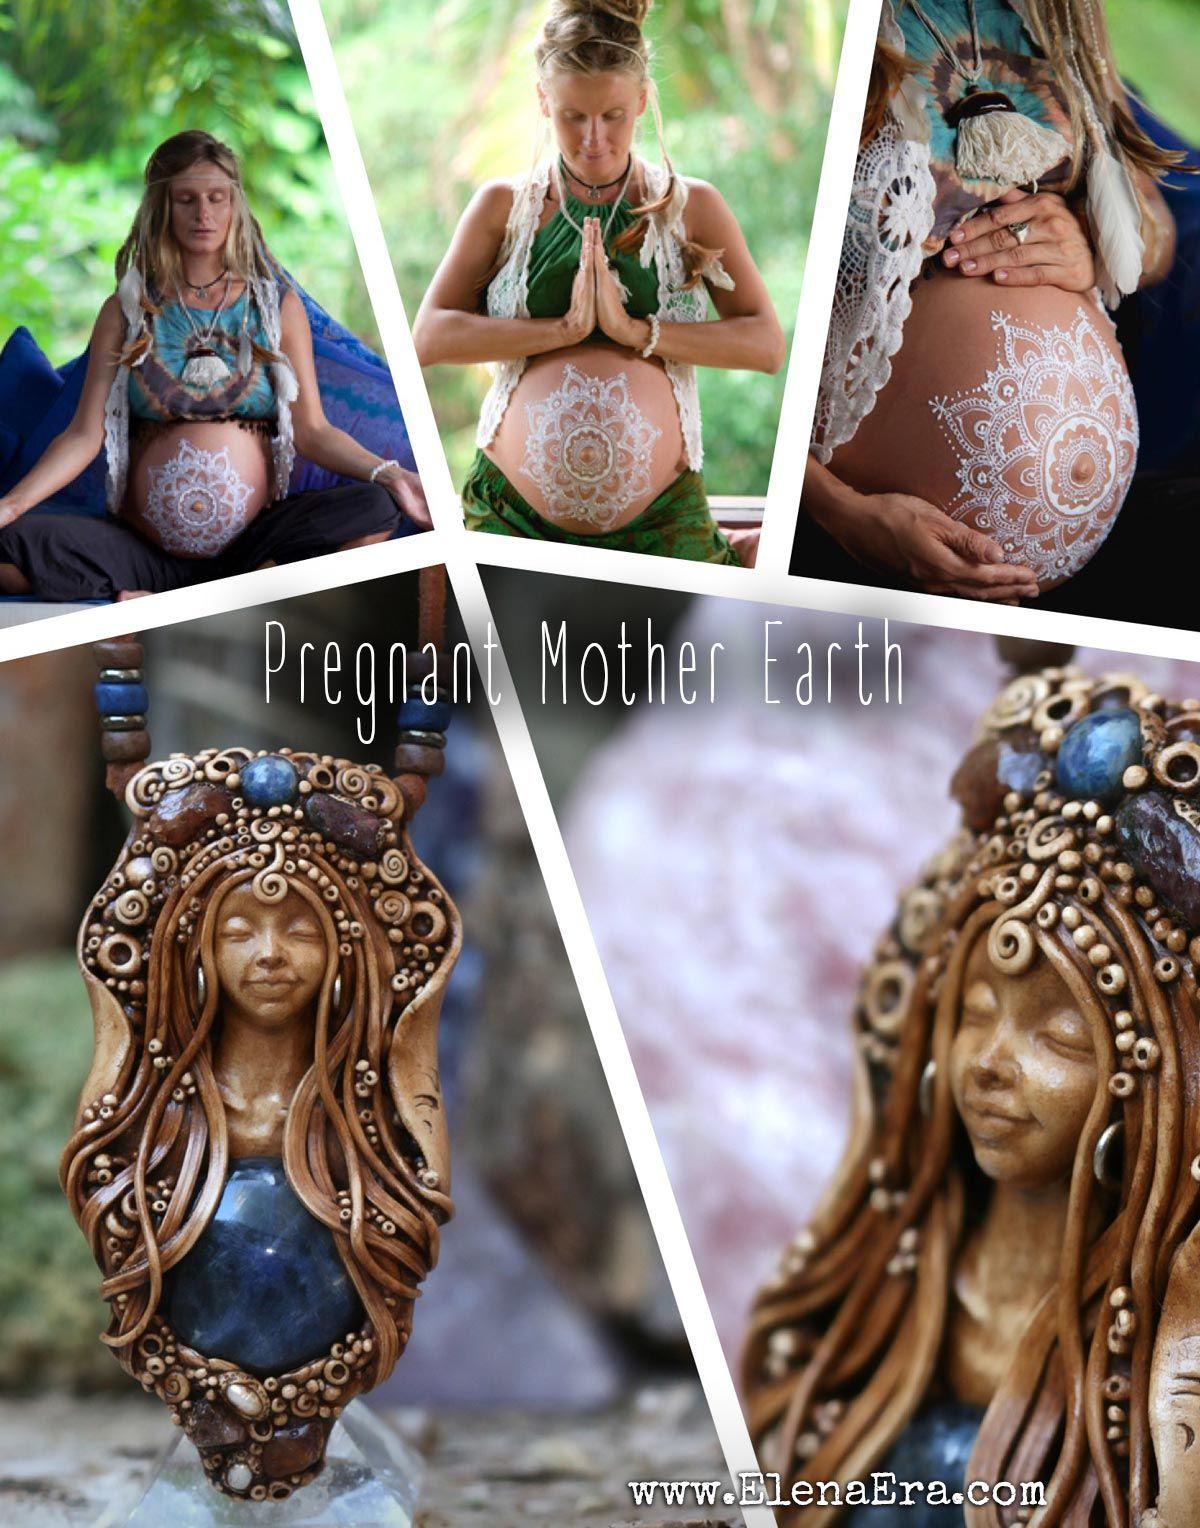 boho necklace healing jewelry healing necklace boho gypsy necklace bohemian necklace Pregnant Mother Earth Gypsy boho jewelry